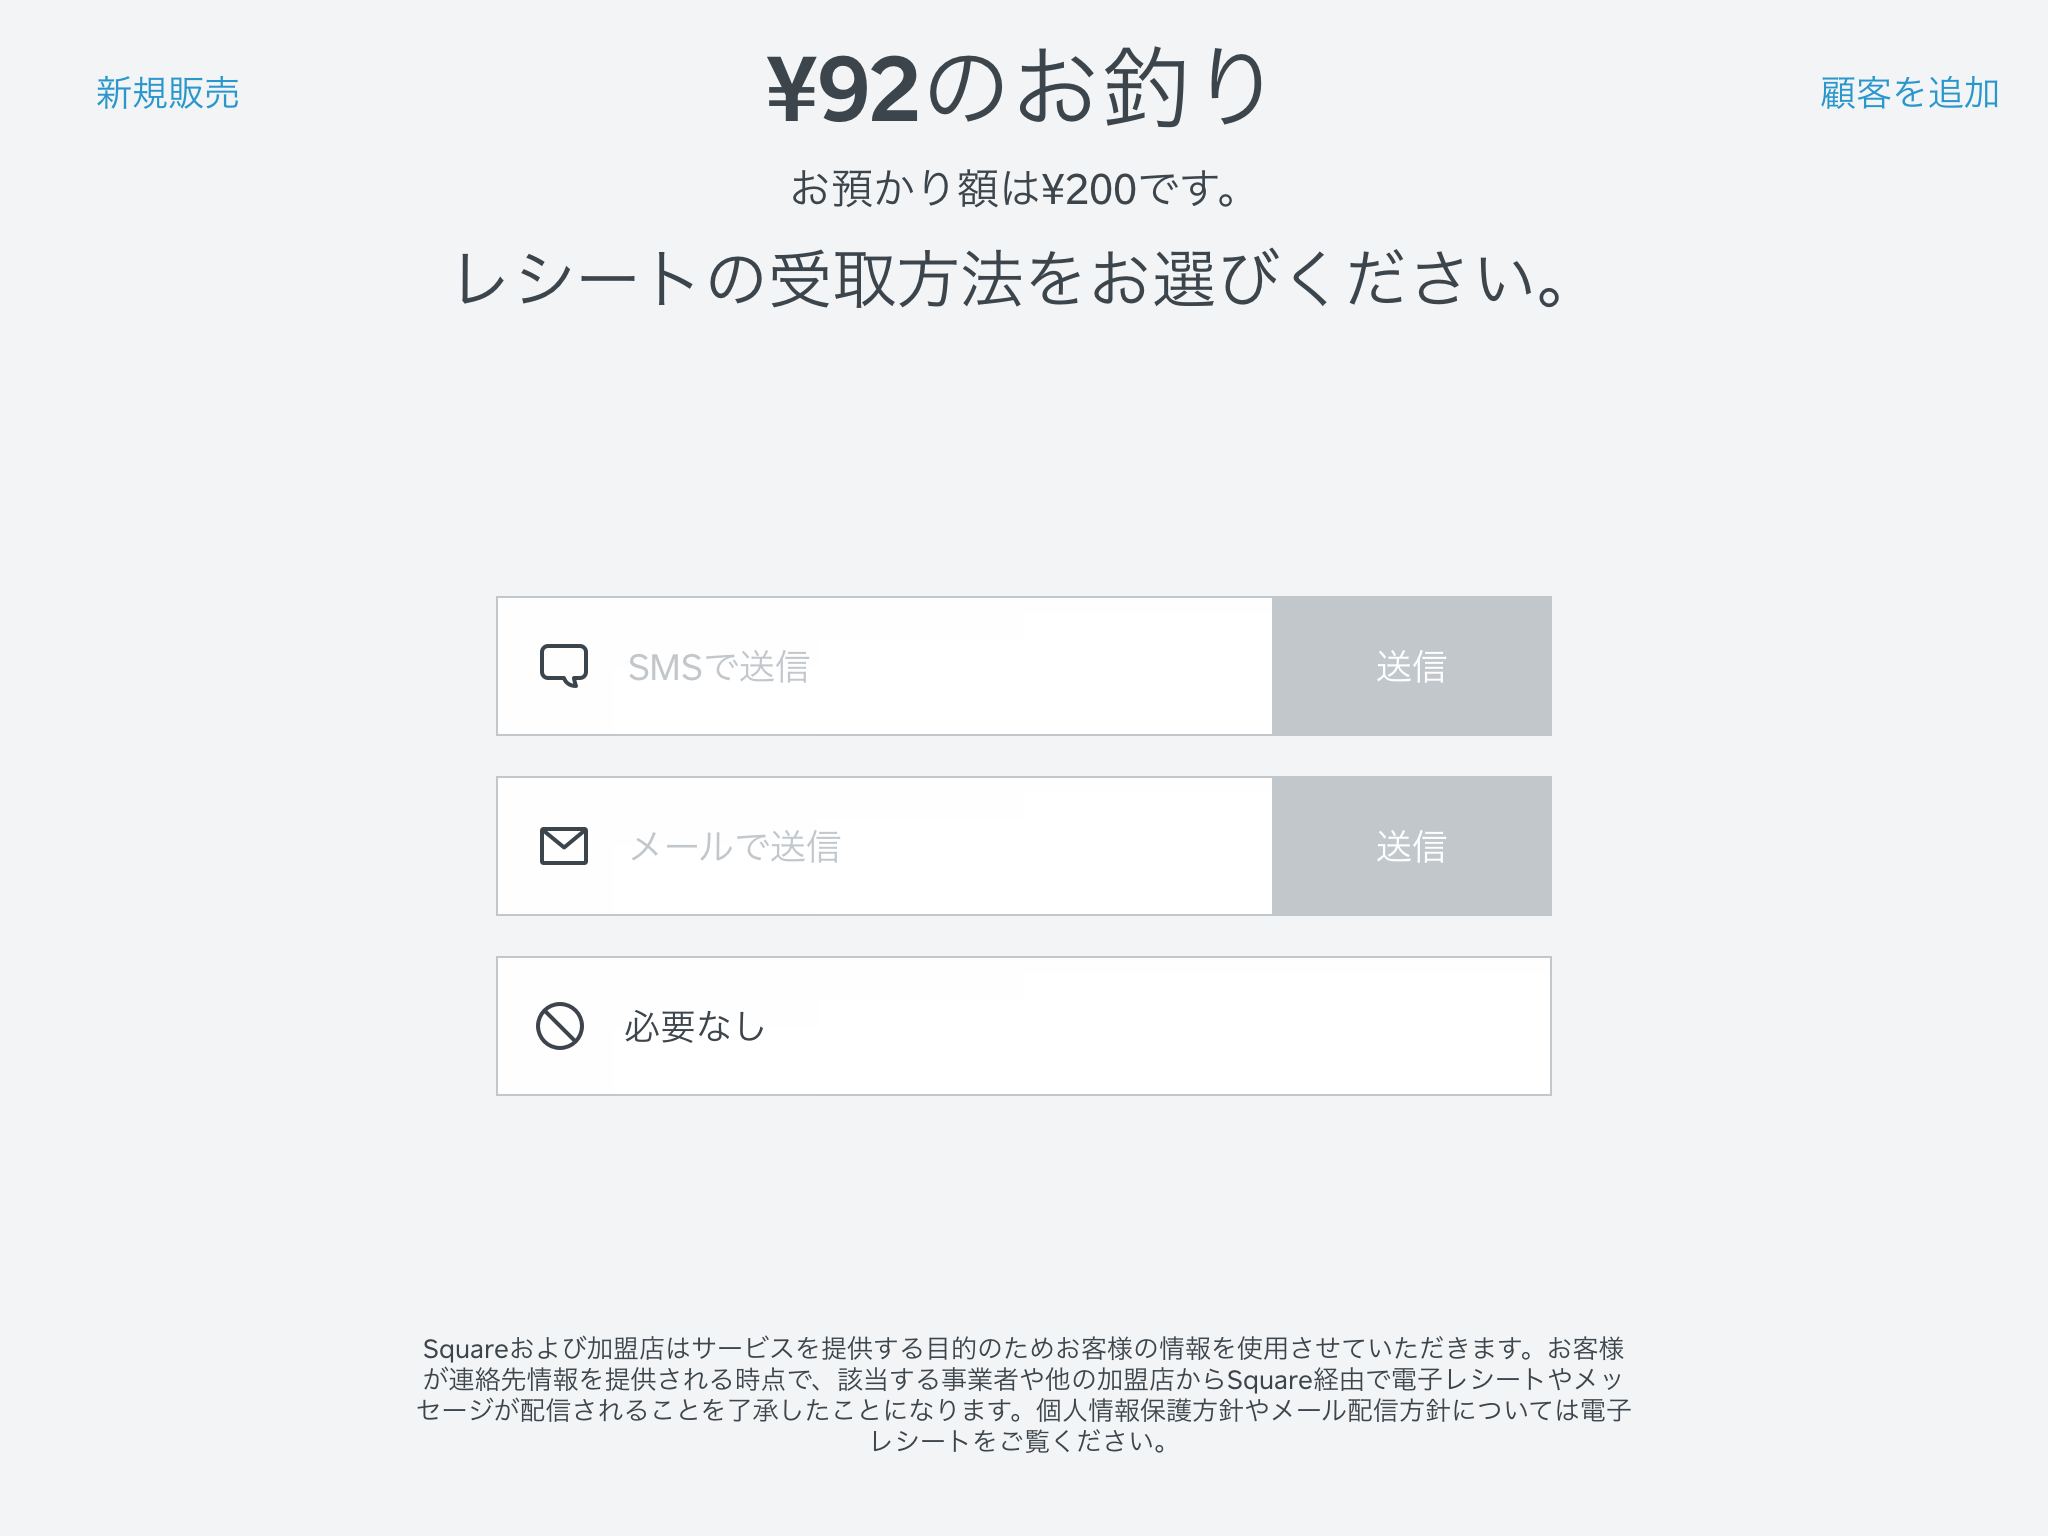 JP Only Send Digital Receipt on a Tablet